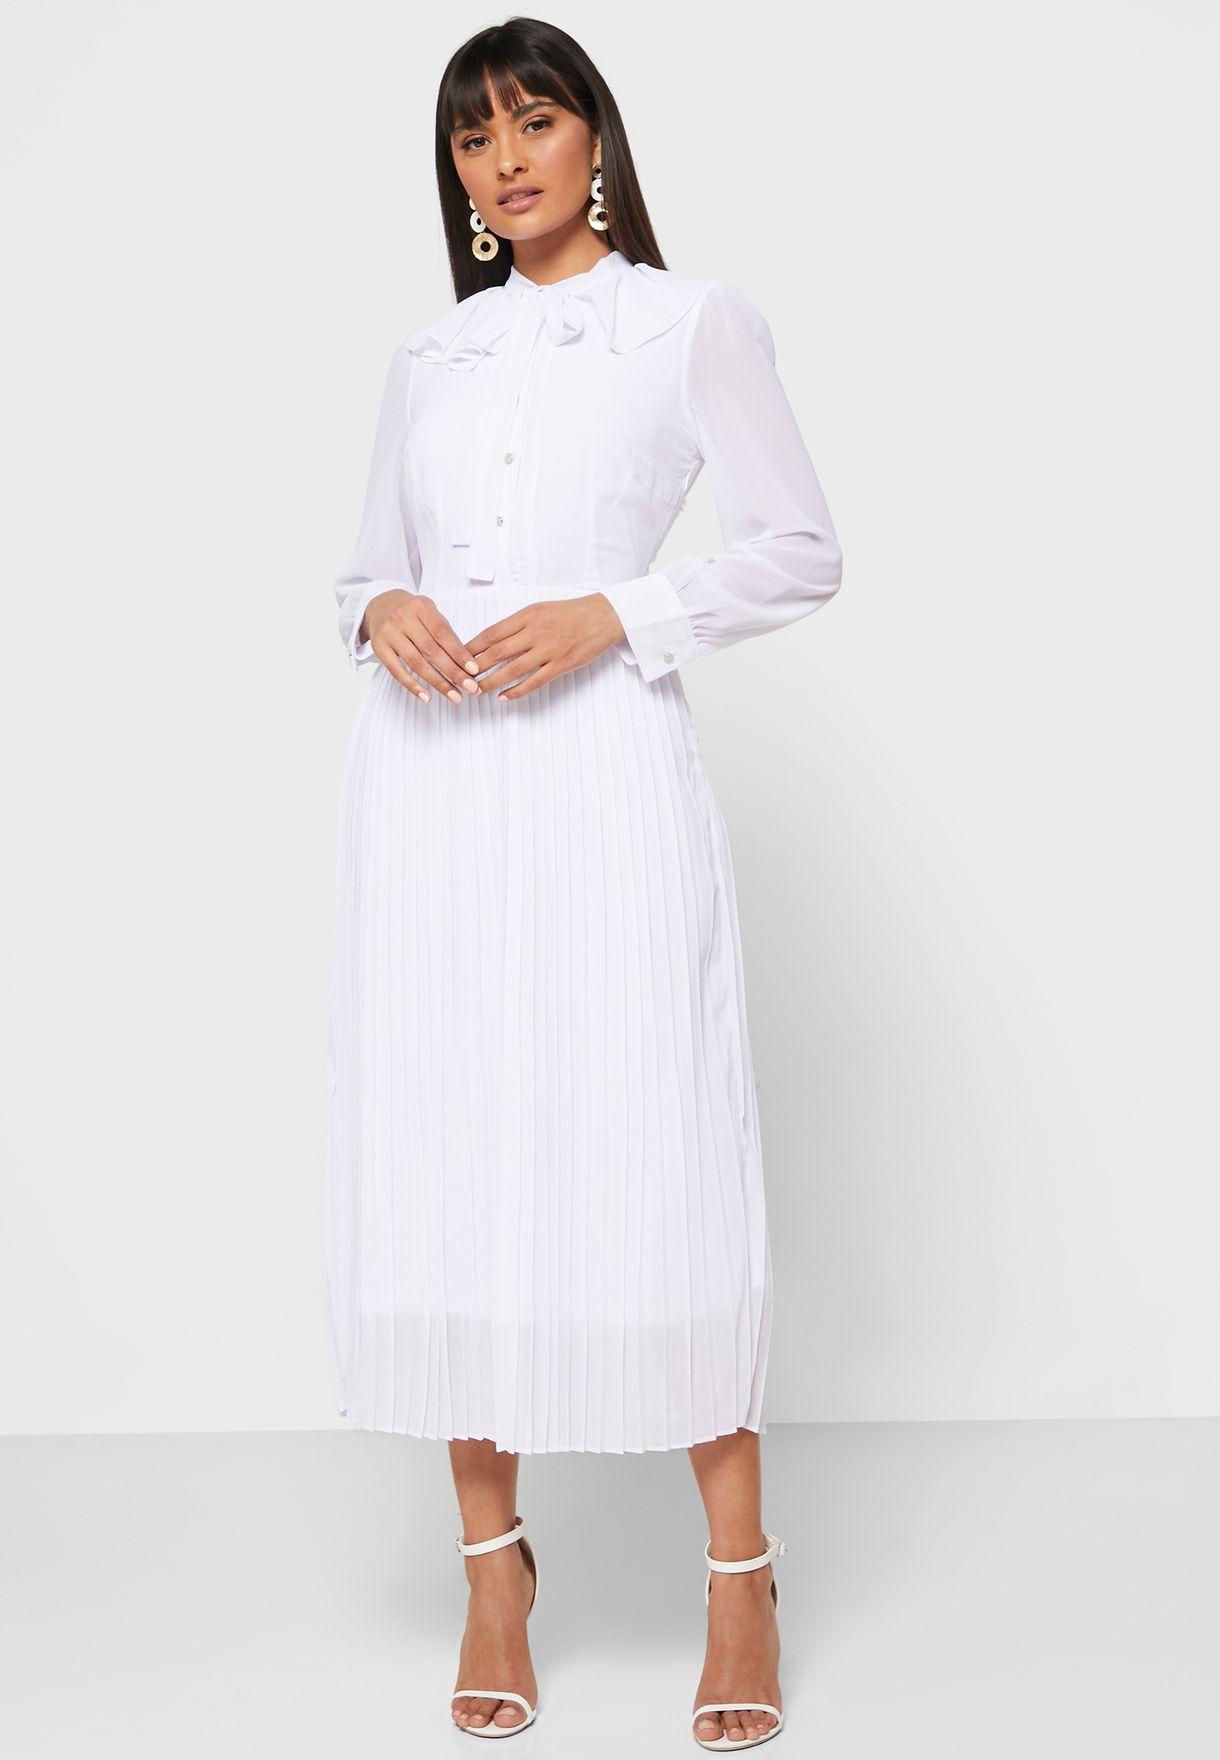 Pleated Skirt Tie Neck Shirt Midi Dress